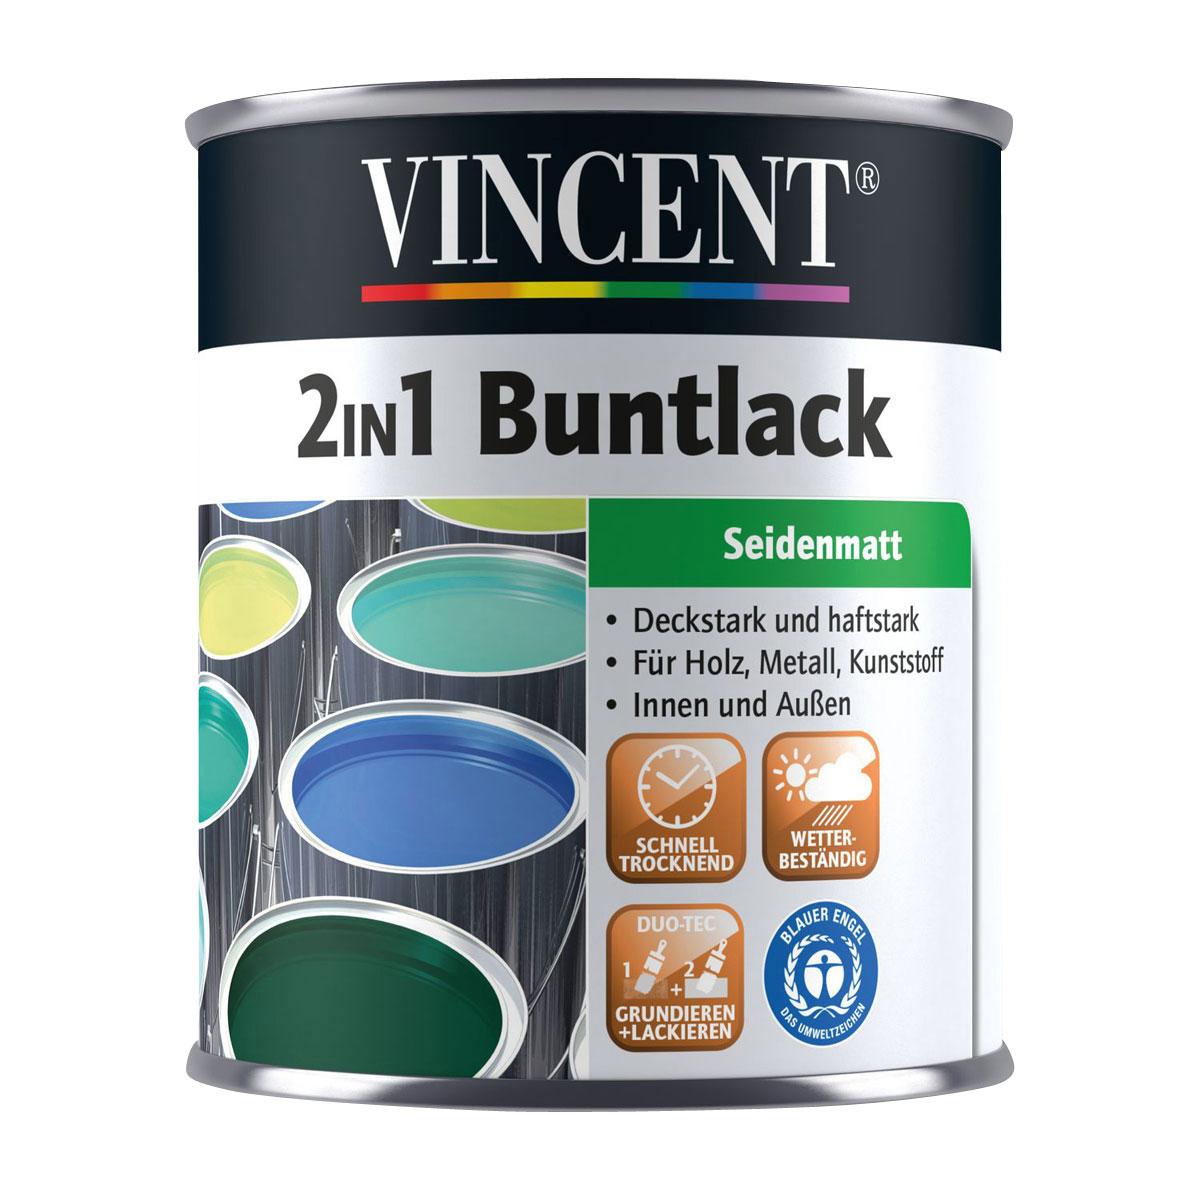 Vincent 2in1 Buntlack bordeaux